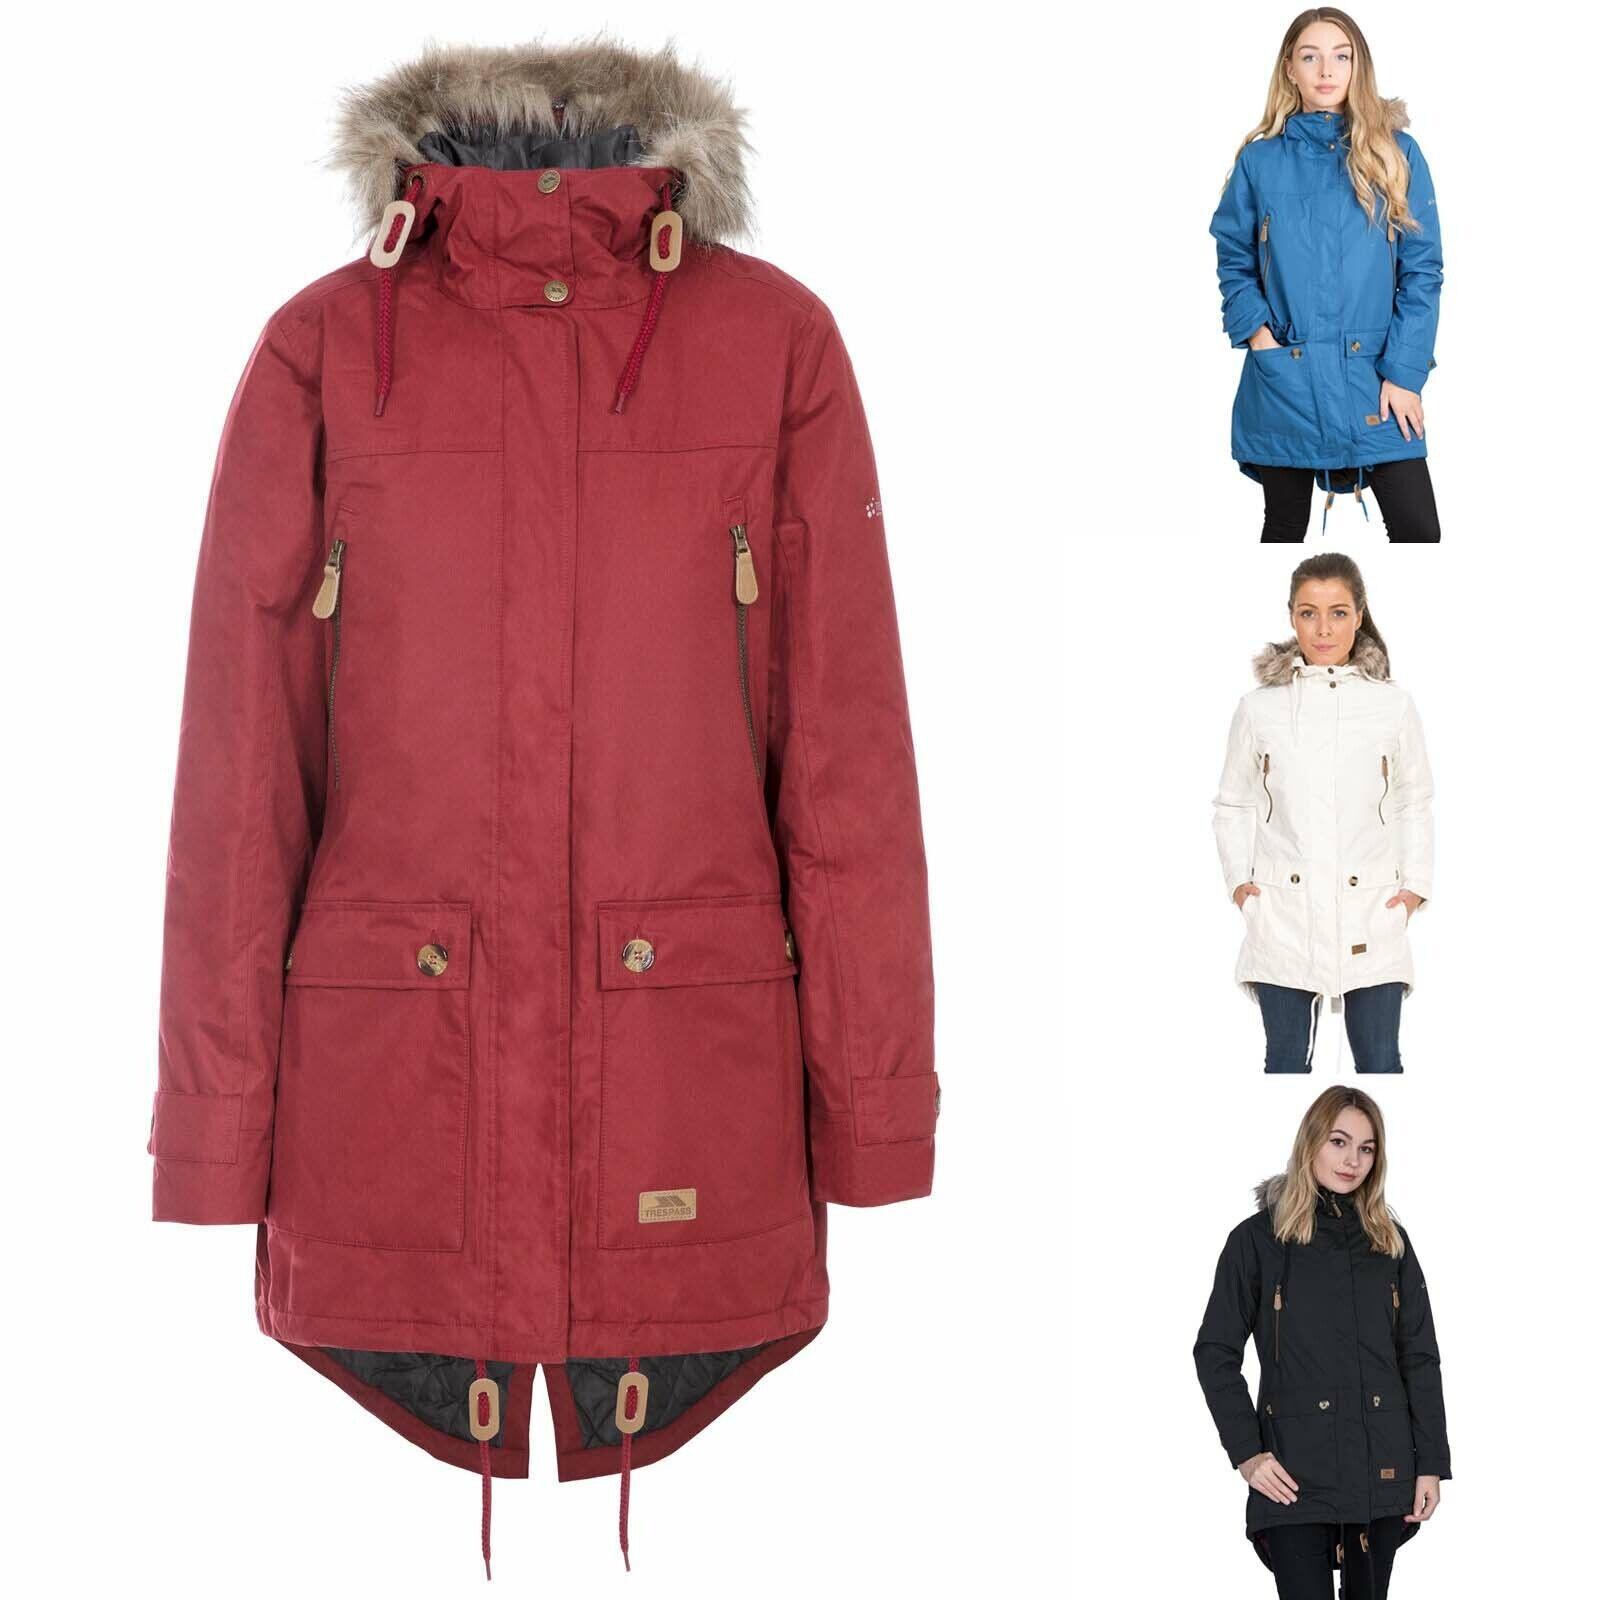 Trespass Clea Womens Waterproof Padded Jacket   Ladies Long Coat with Taped Seam